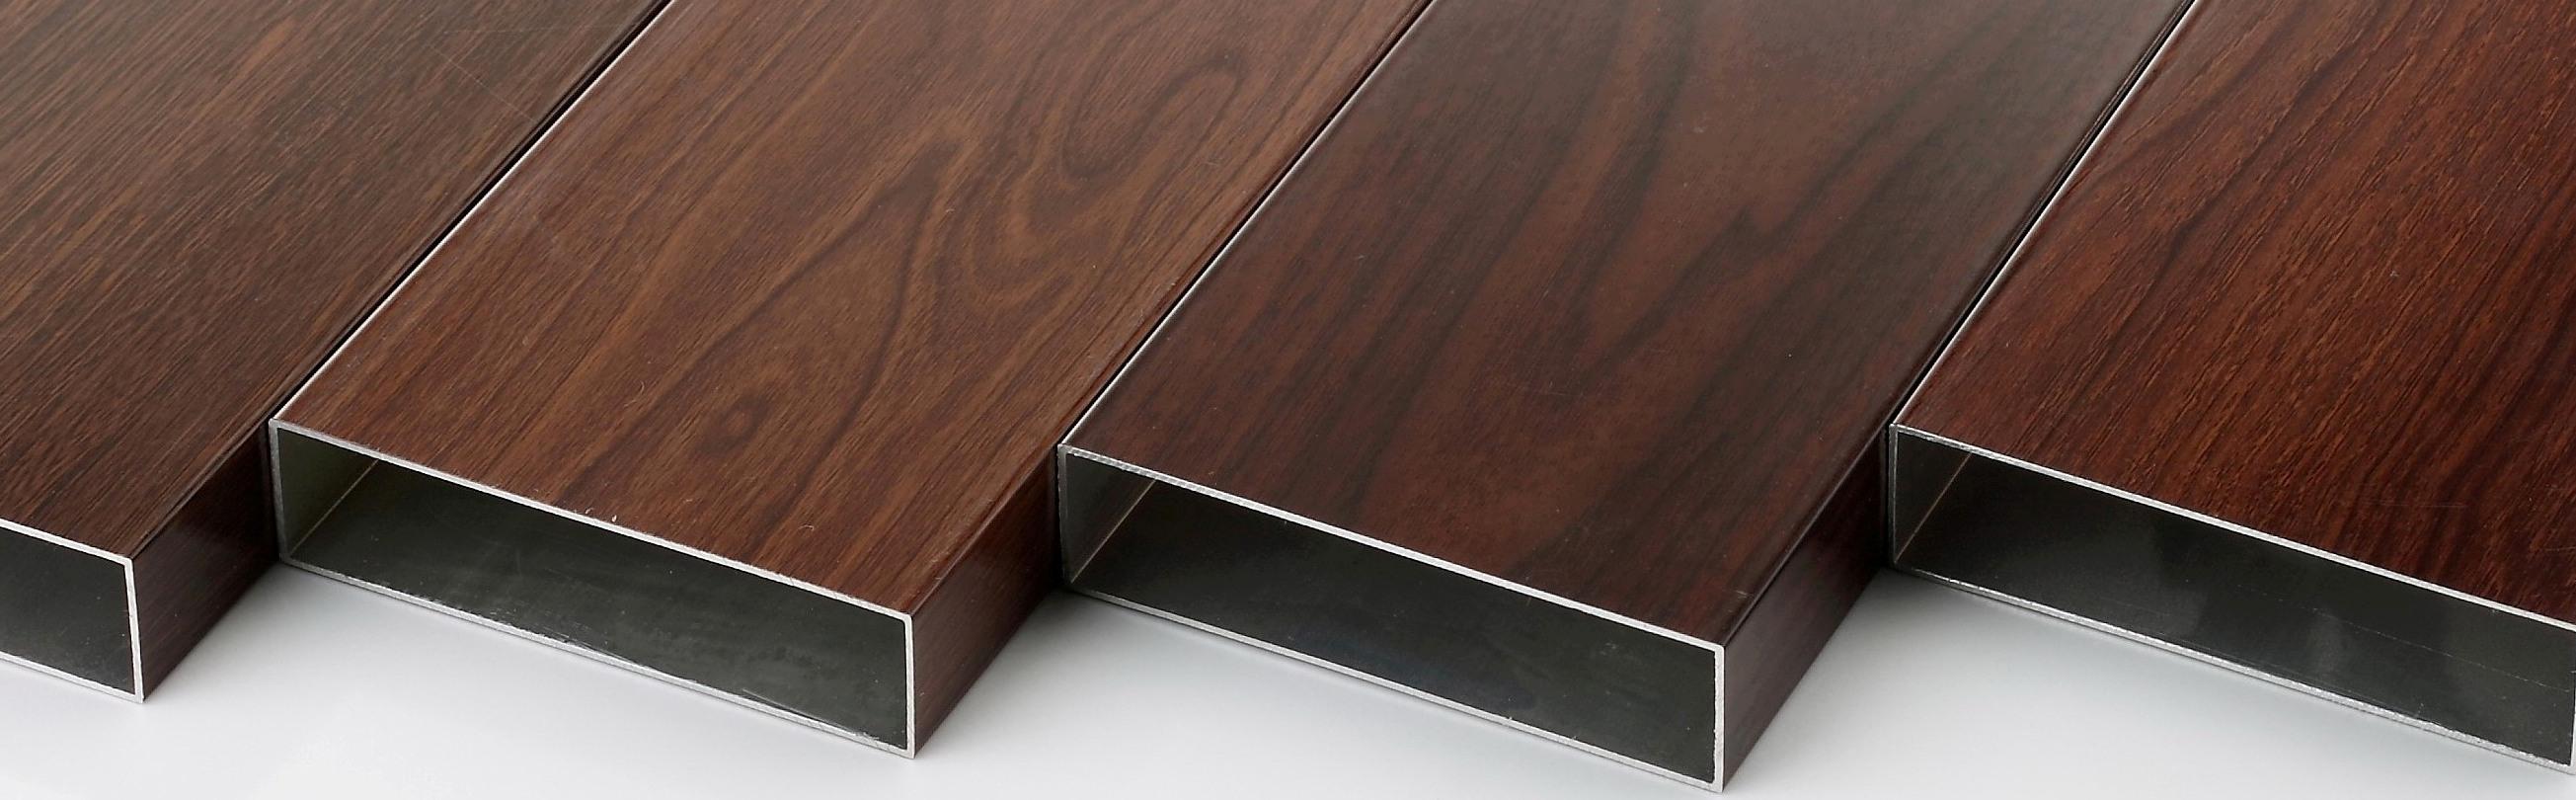 Kitchen Cabinet Companies Elite Group Of Companies Aluminium Profiles Thermal